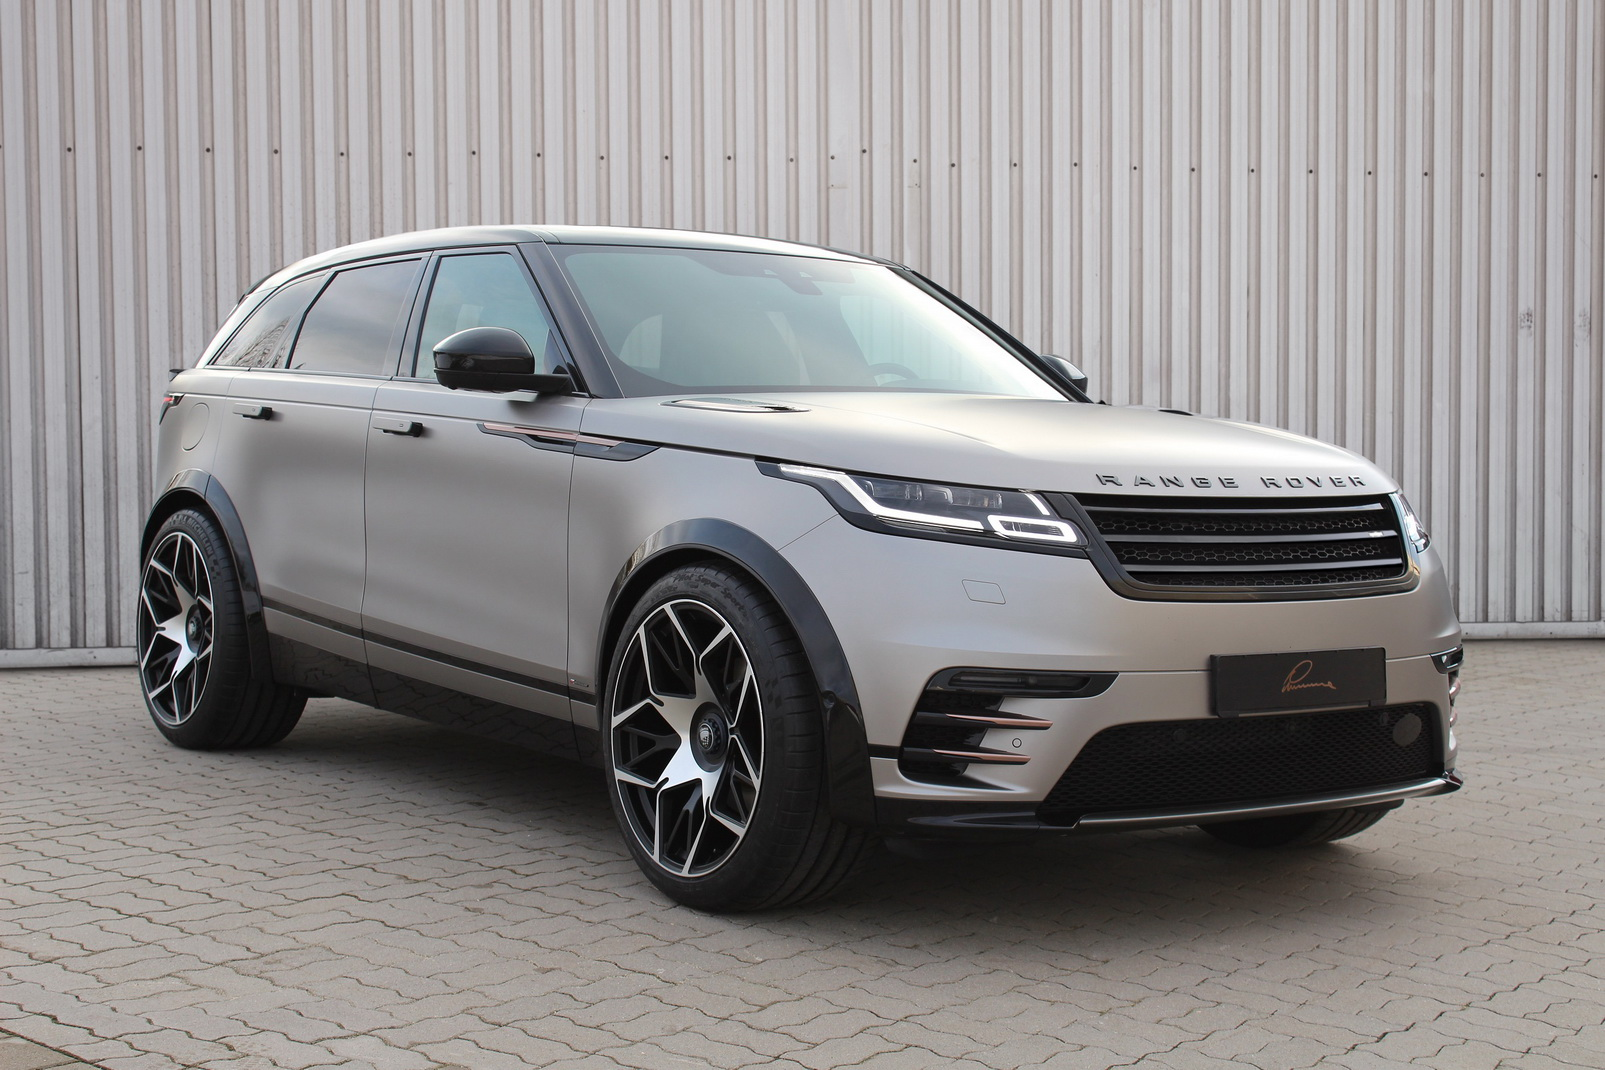 Subtle Range Rover Velar Tuning By Lumma Design